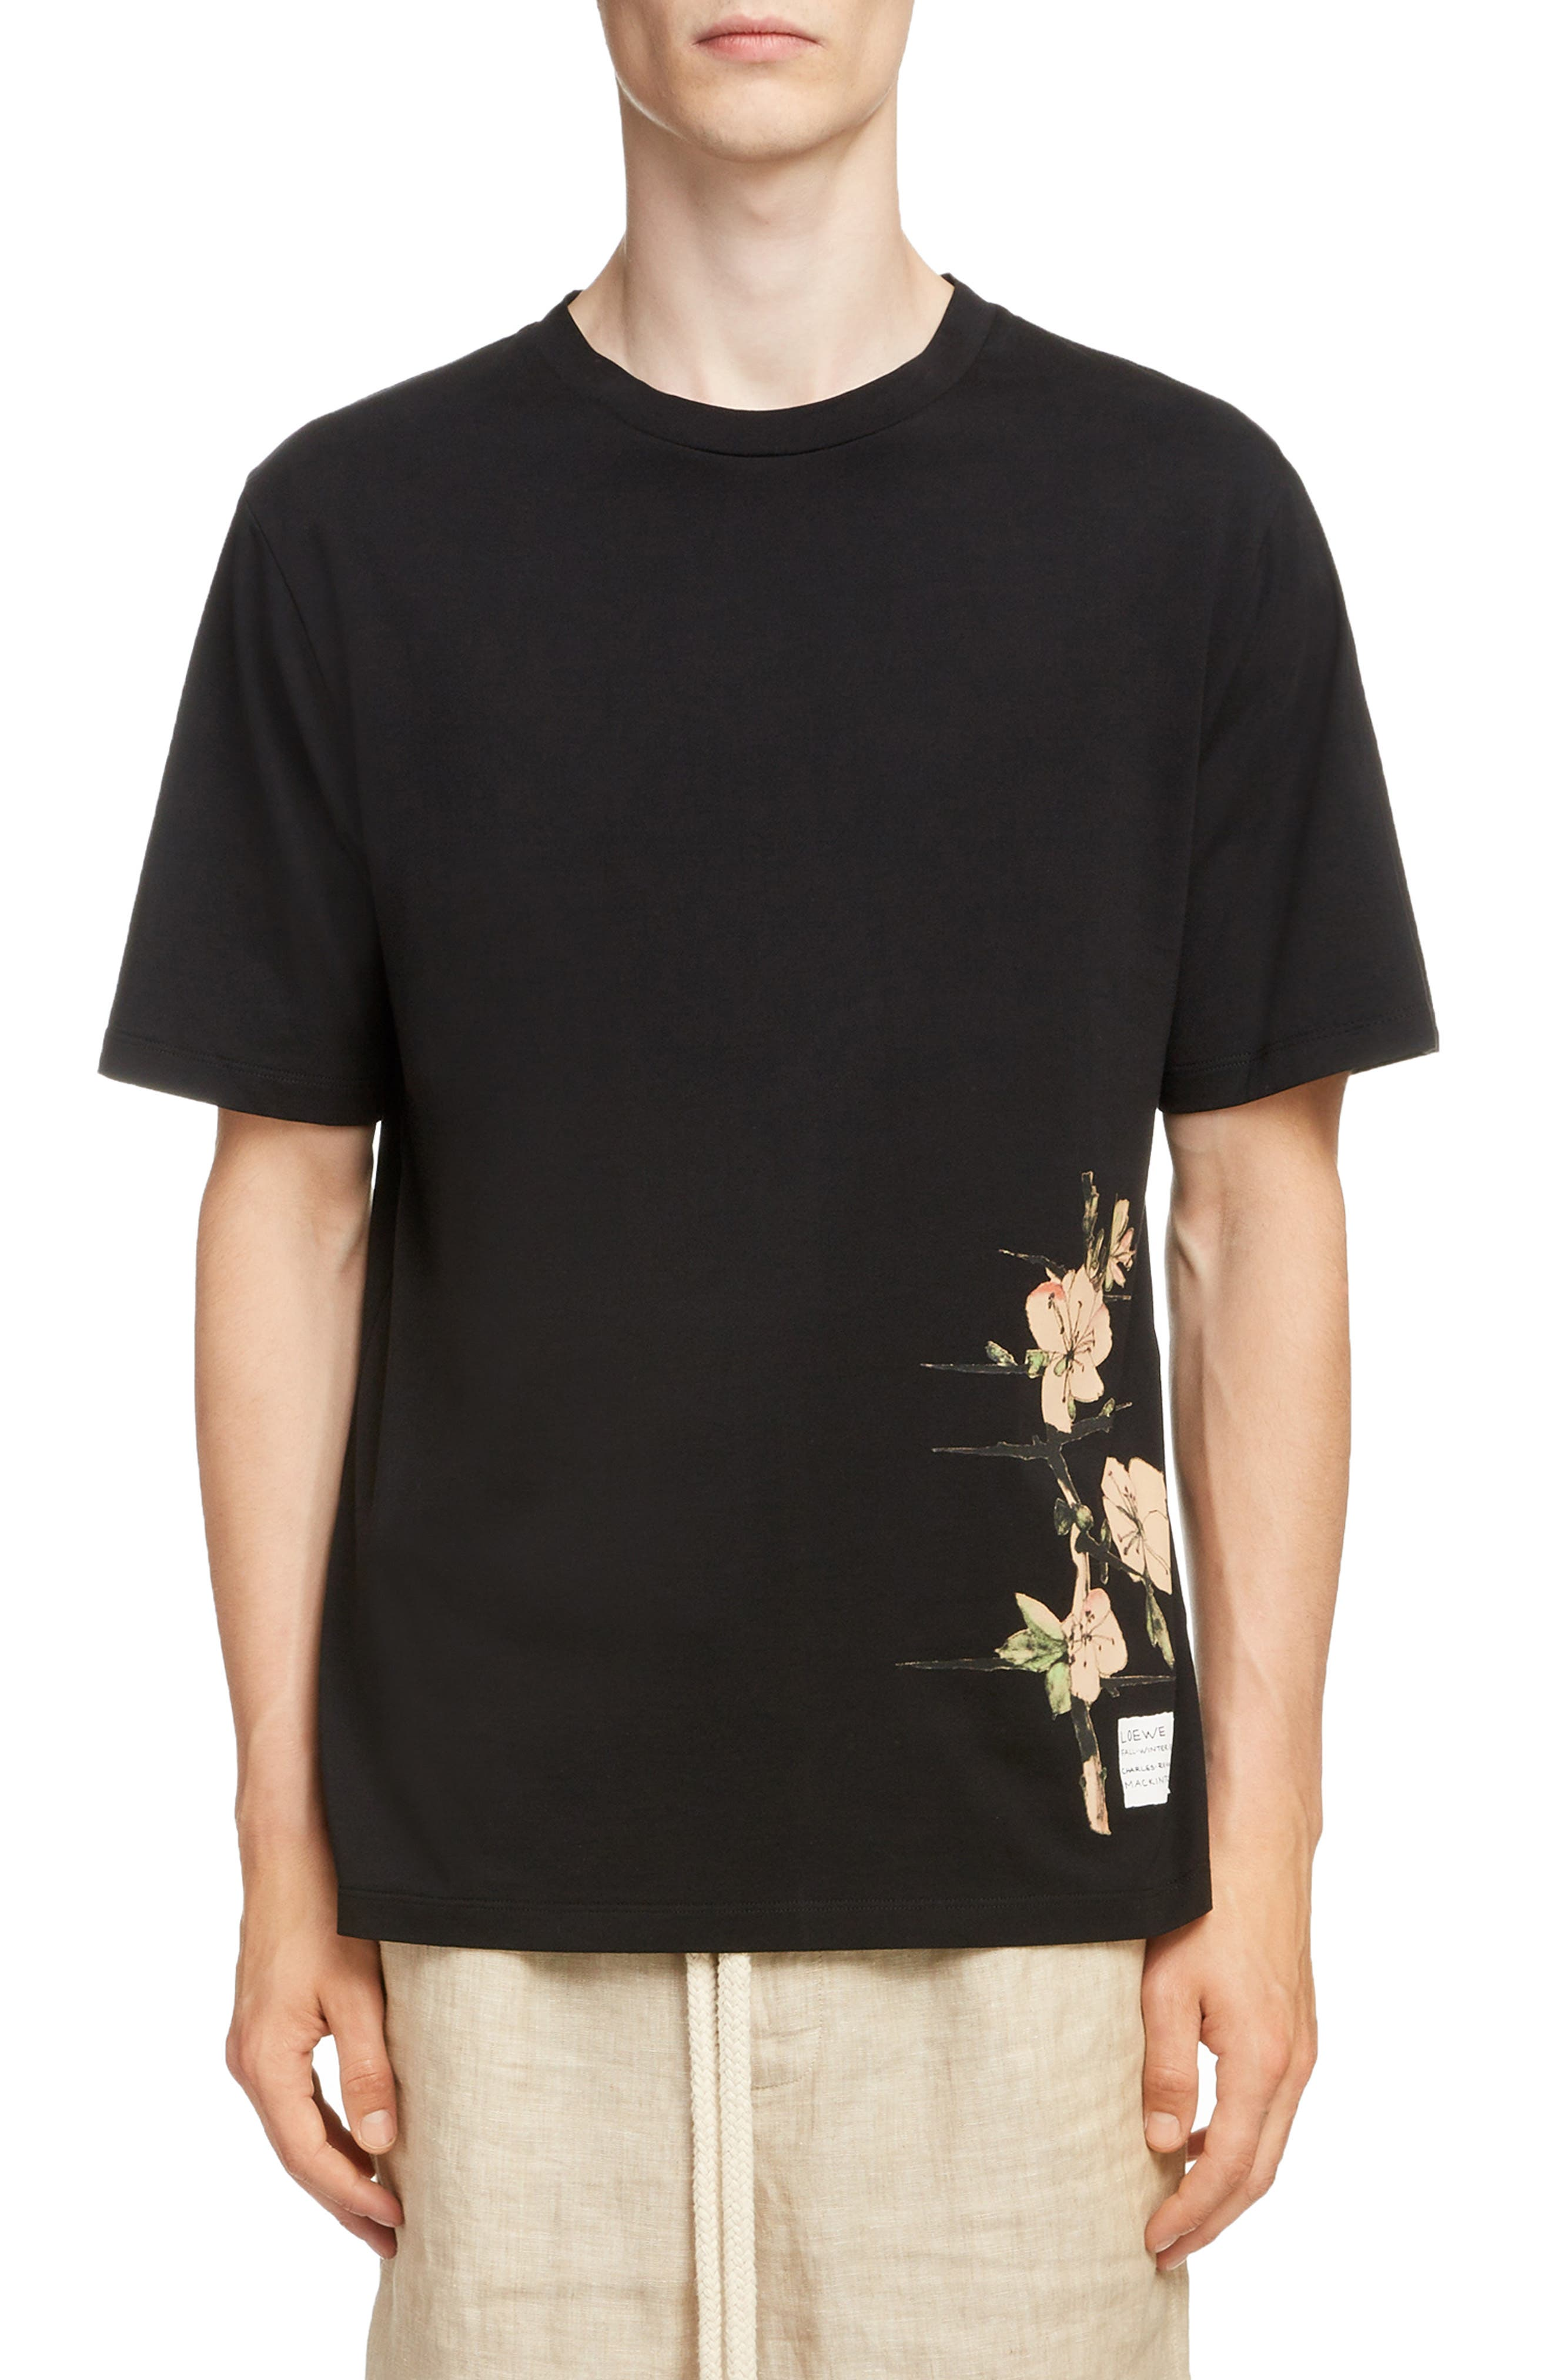 LOEWE, Charles Rennie Mackintosh Collection Botanical Print T-Shirt, Main thumbnail 1, color, 1100-BLACK